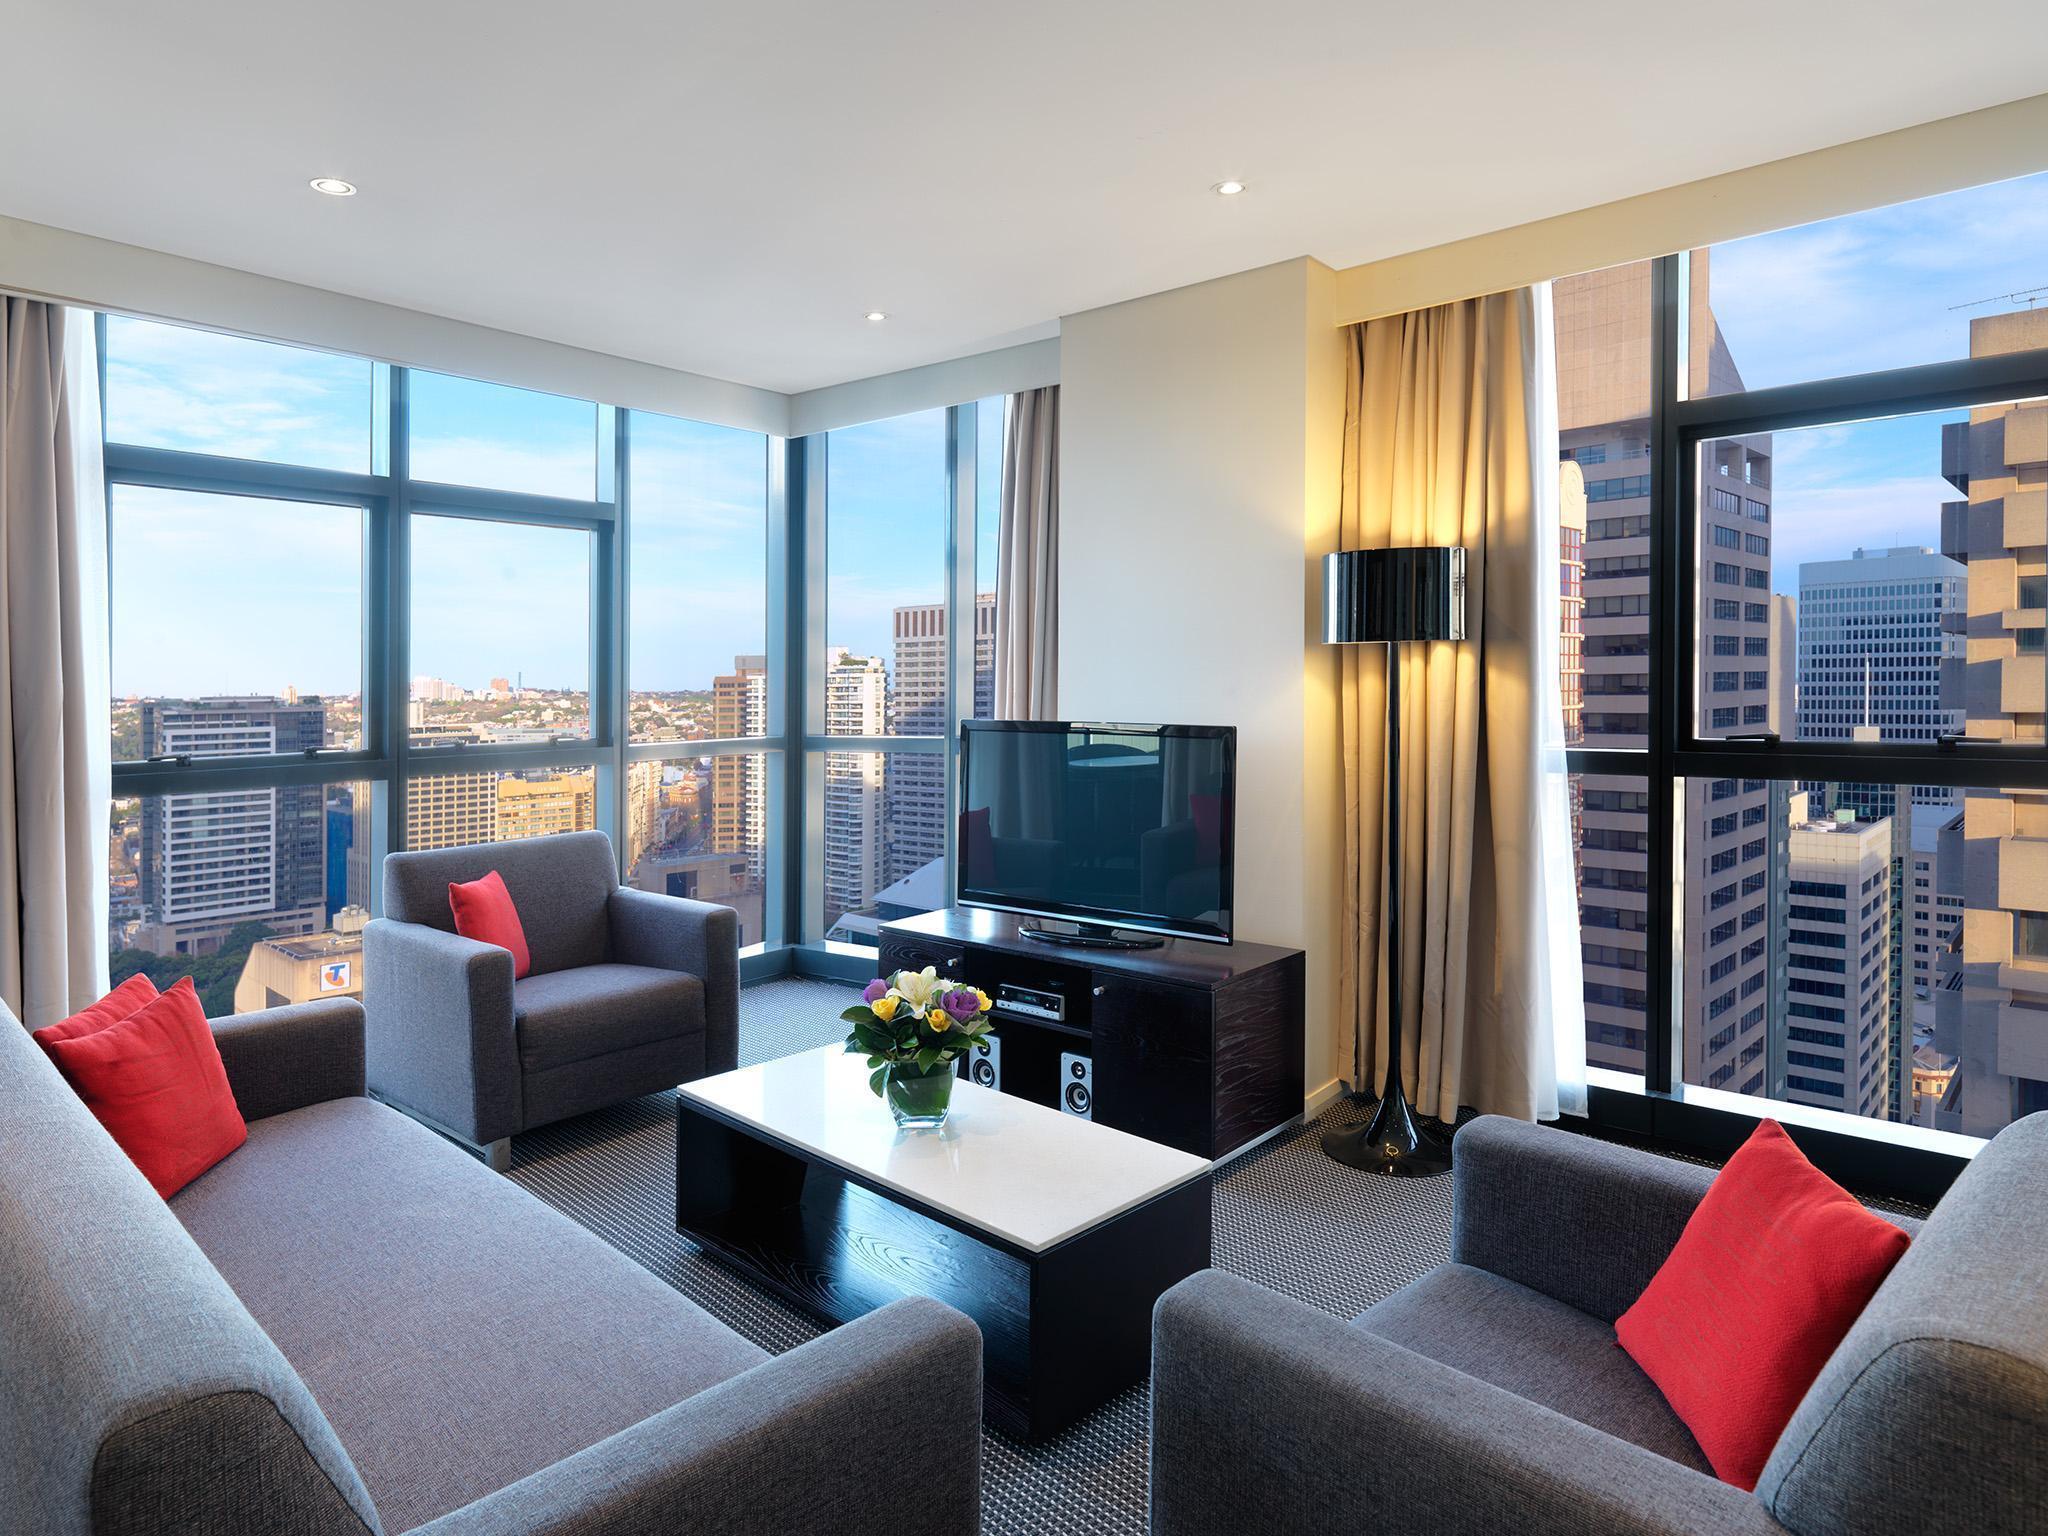 Best Price on Meriton Suites Pitt Street in Sydney + Reviews!